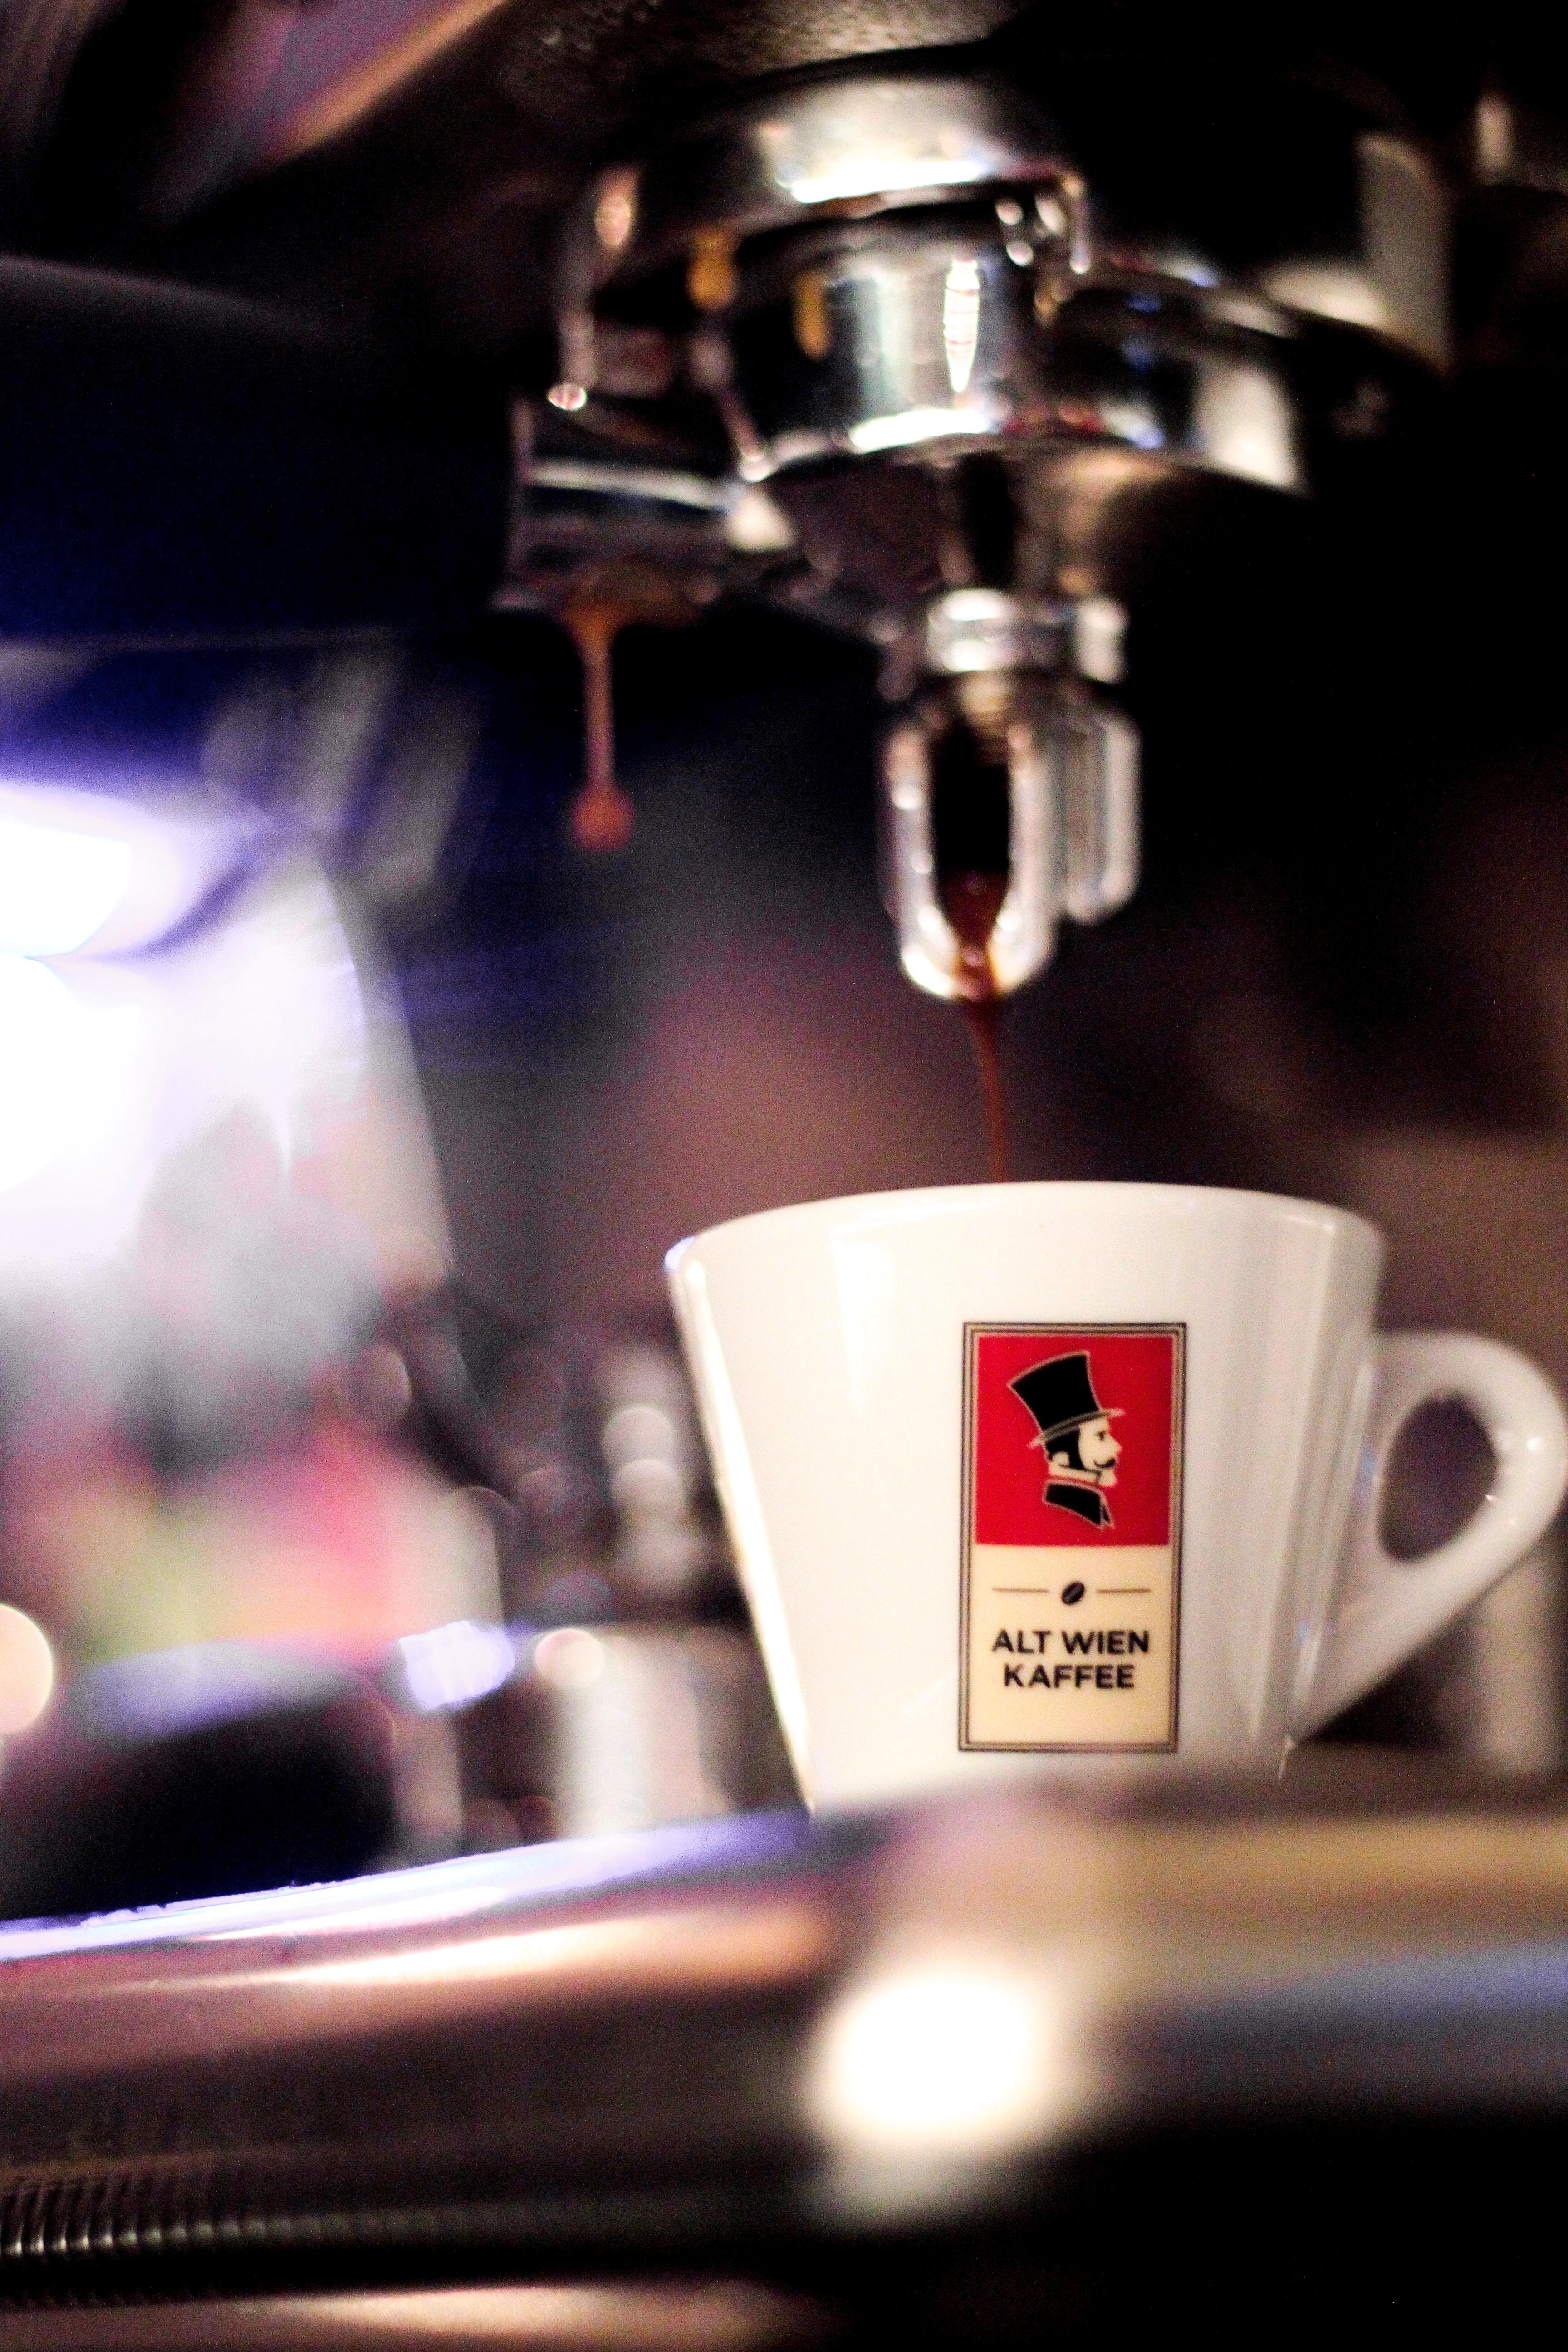 pancho alt wien kaffee